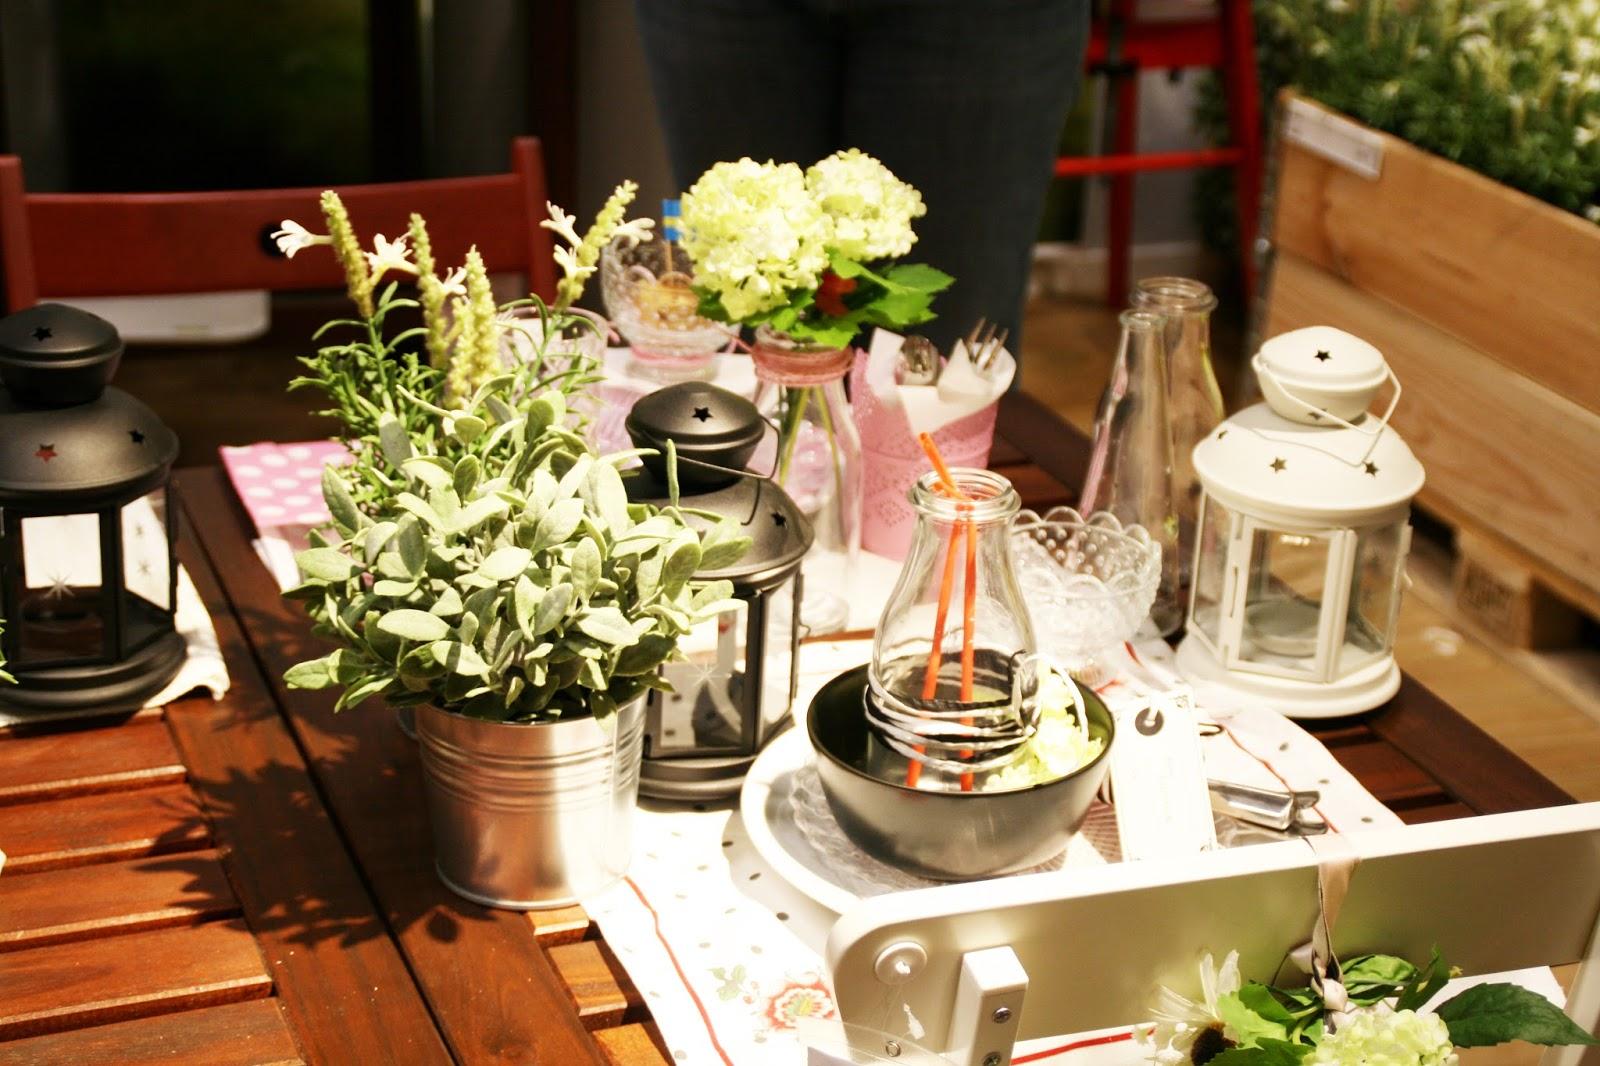 Sehnsuchtssachen Machmidsommar Bei Ikea Tischdeko